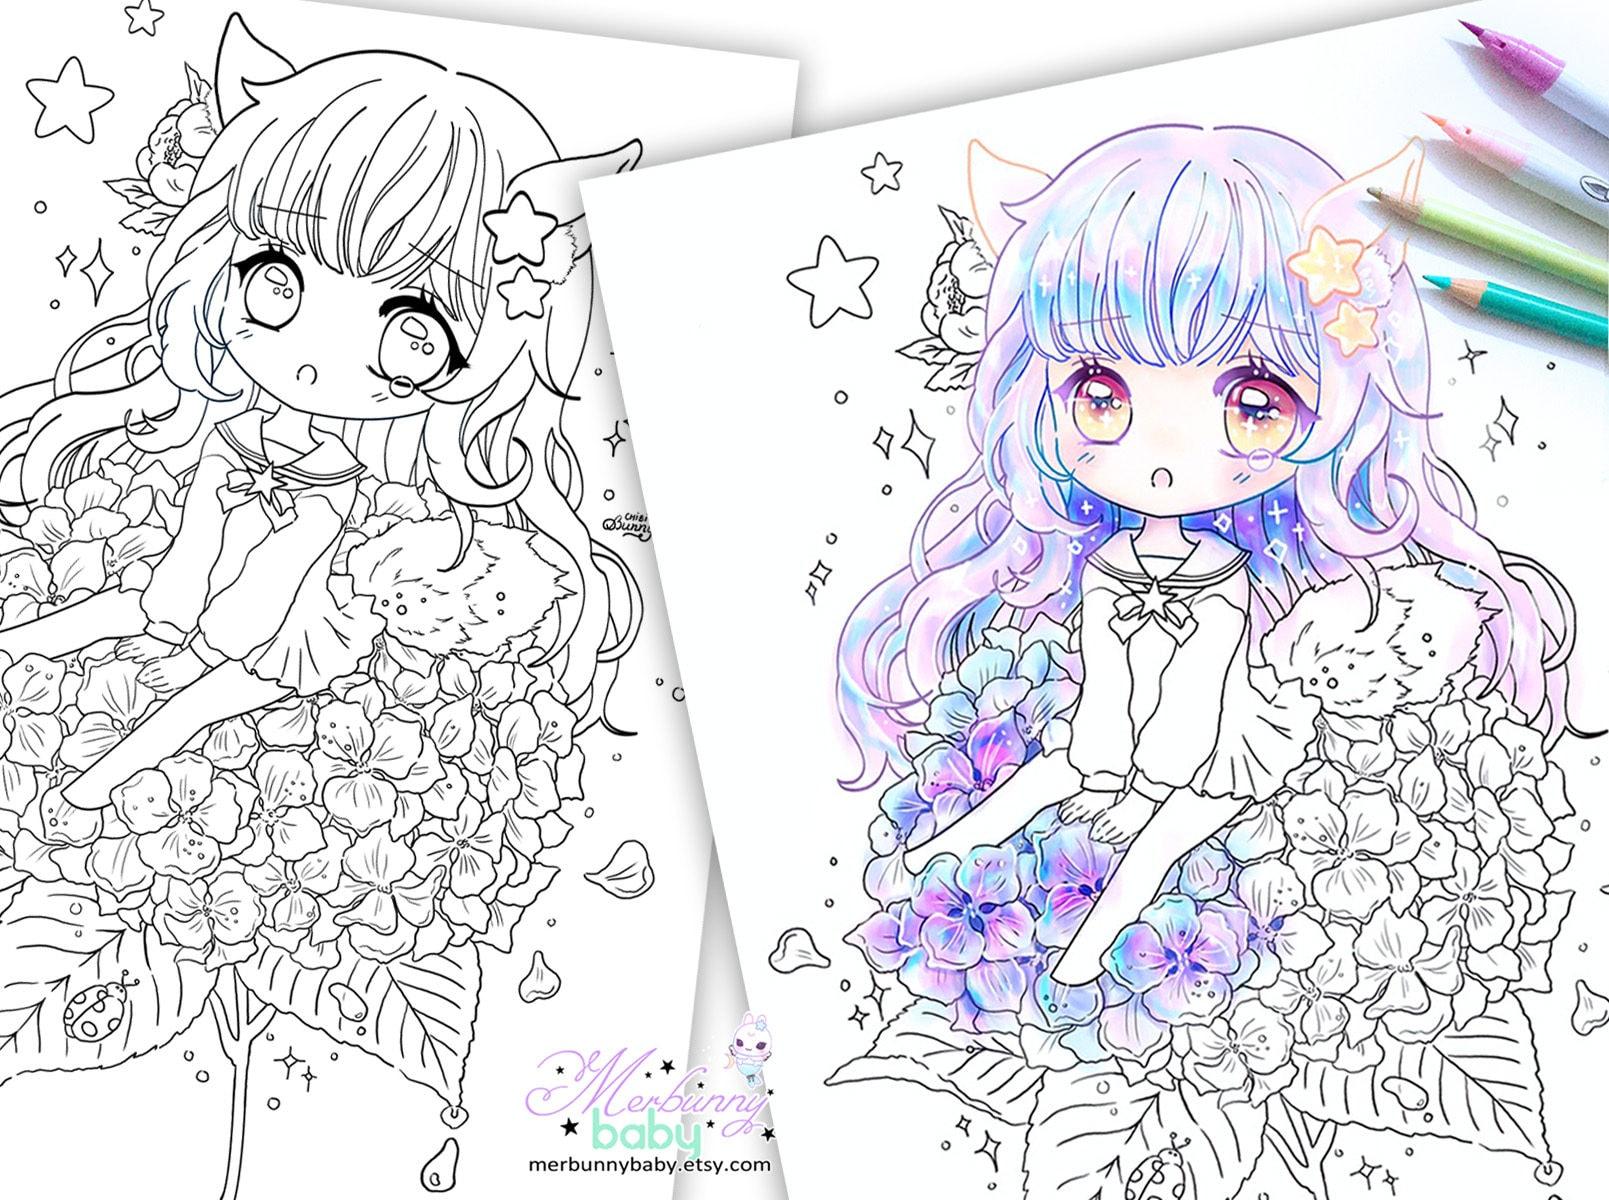 Ausmalbilder Manga Mädchen : Chibi M Dchen Auf Hortensie Malvorlagen S E Anime Manga